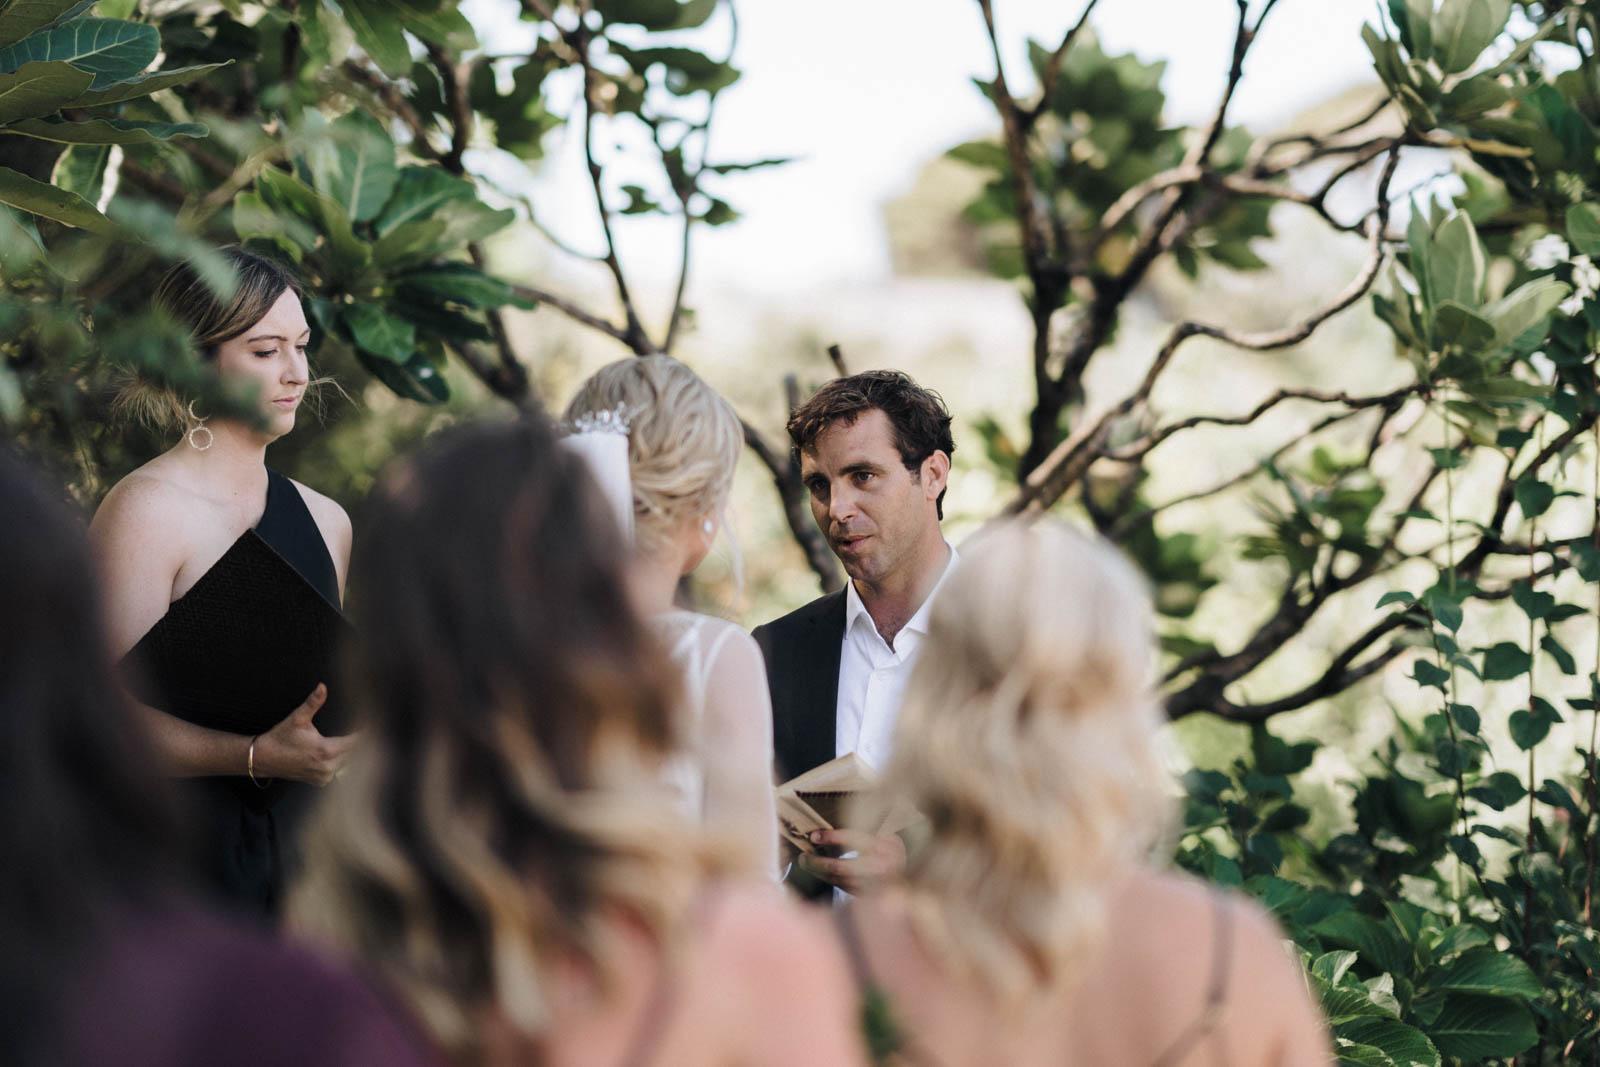 newfound-l-i-coromandel-wedding-photographer-1612-A9_02960